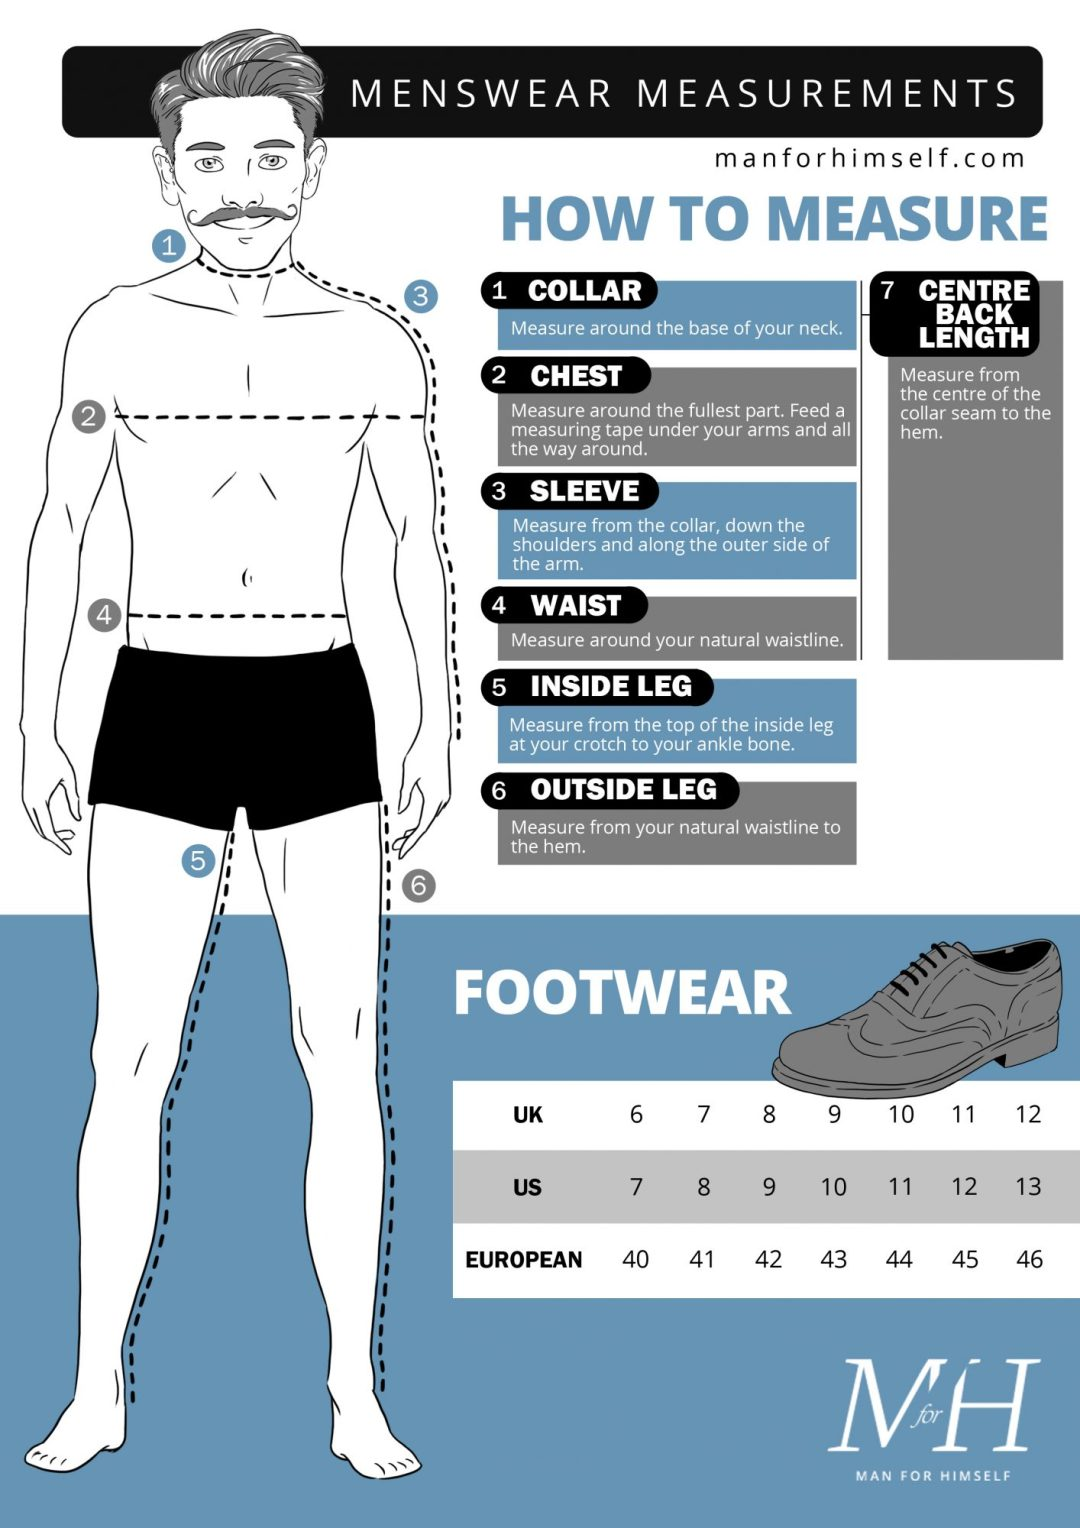 mens-measurements-measure-size-image-diagram-mfh-how-to-menswear_measure_amend